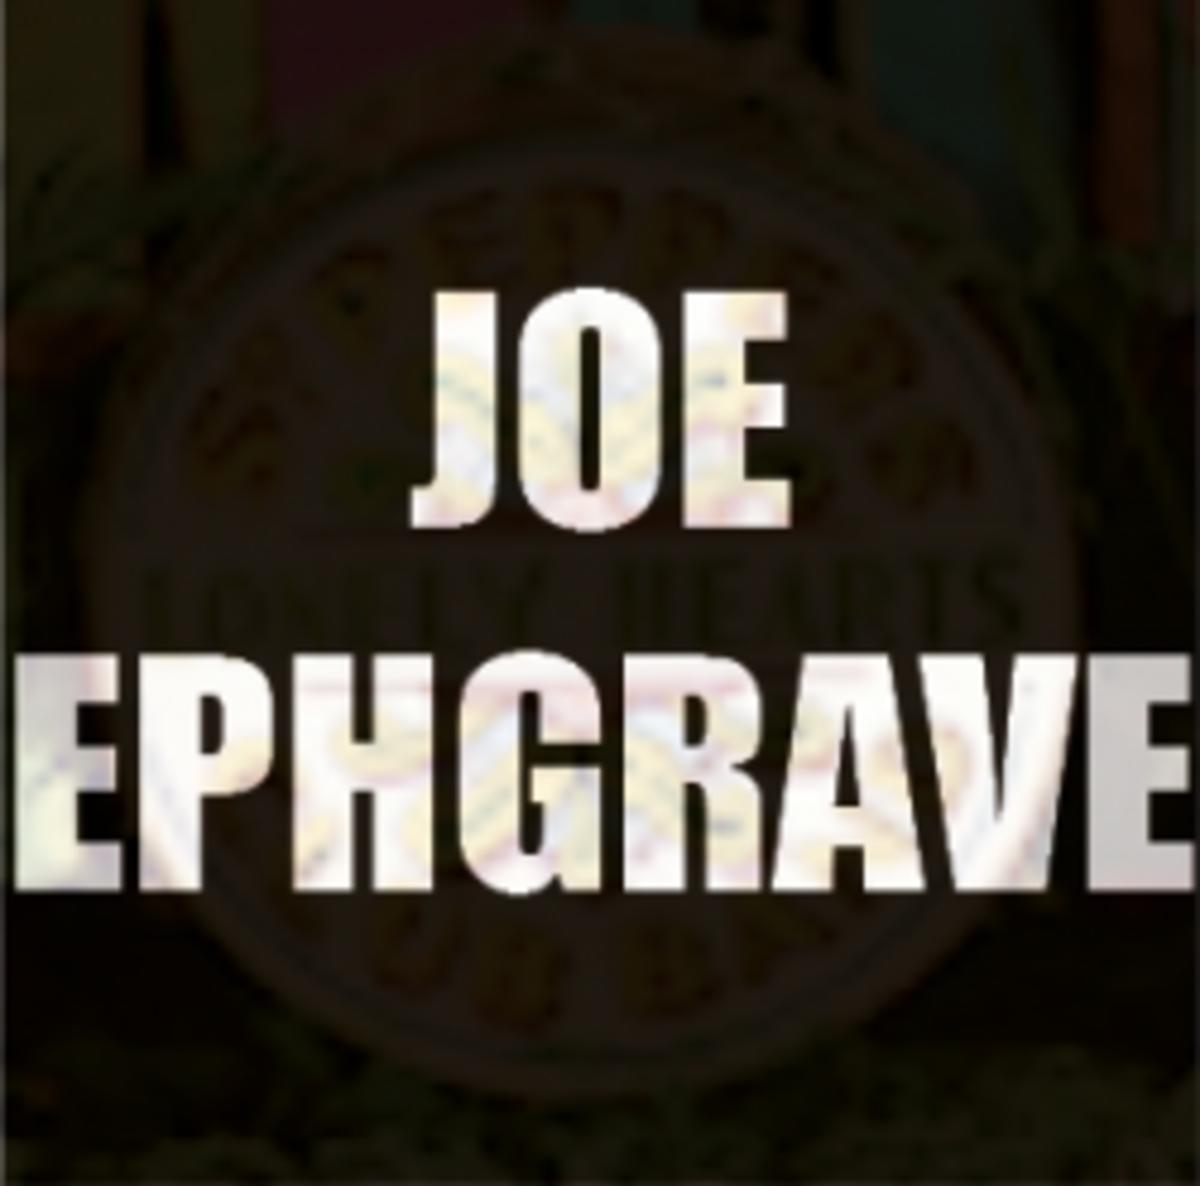 Who was Joe Ephgrave?